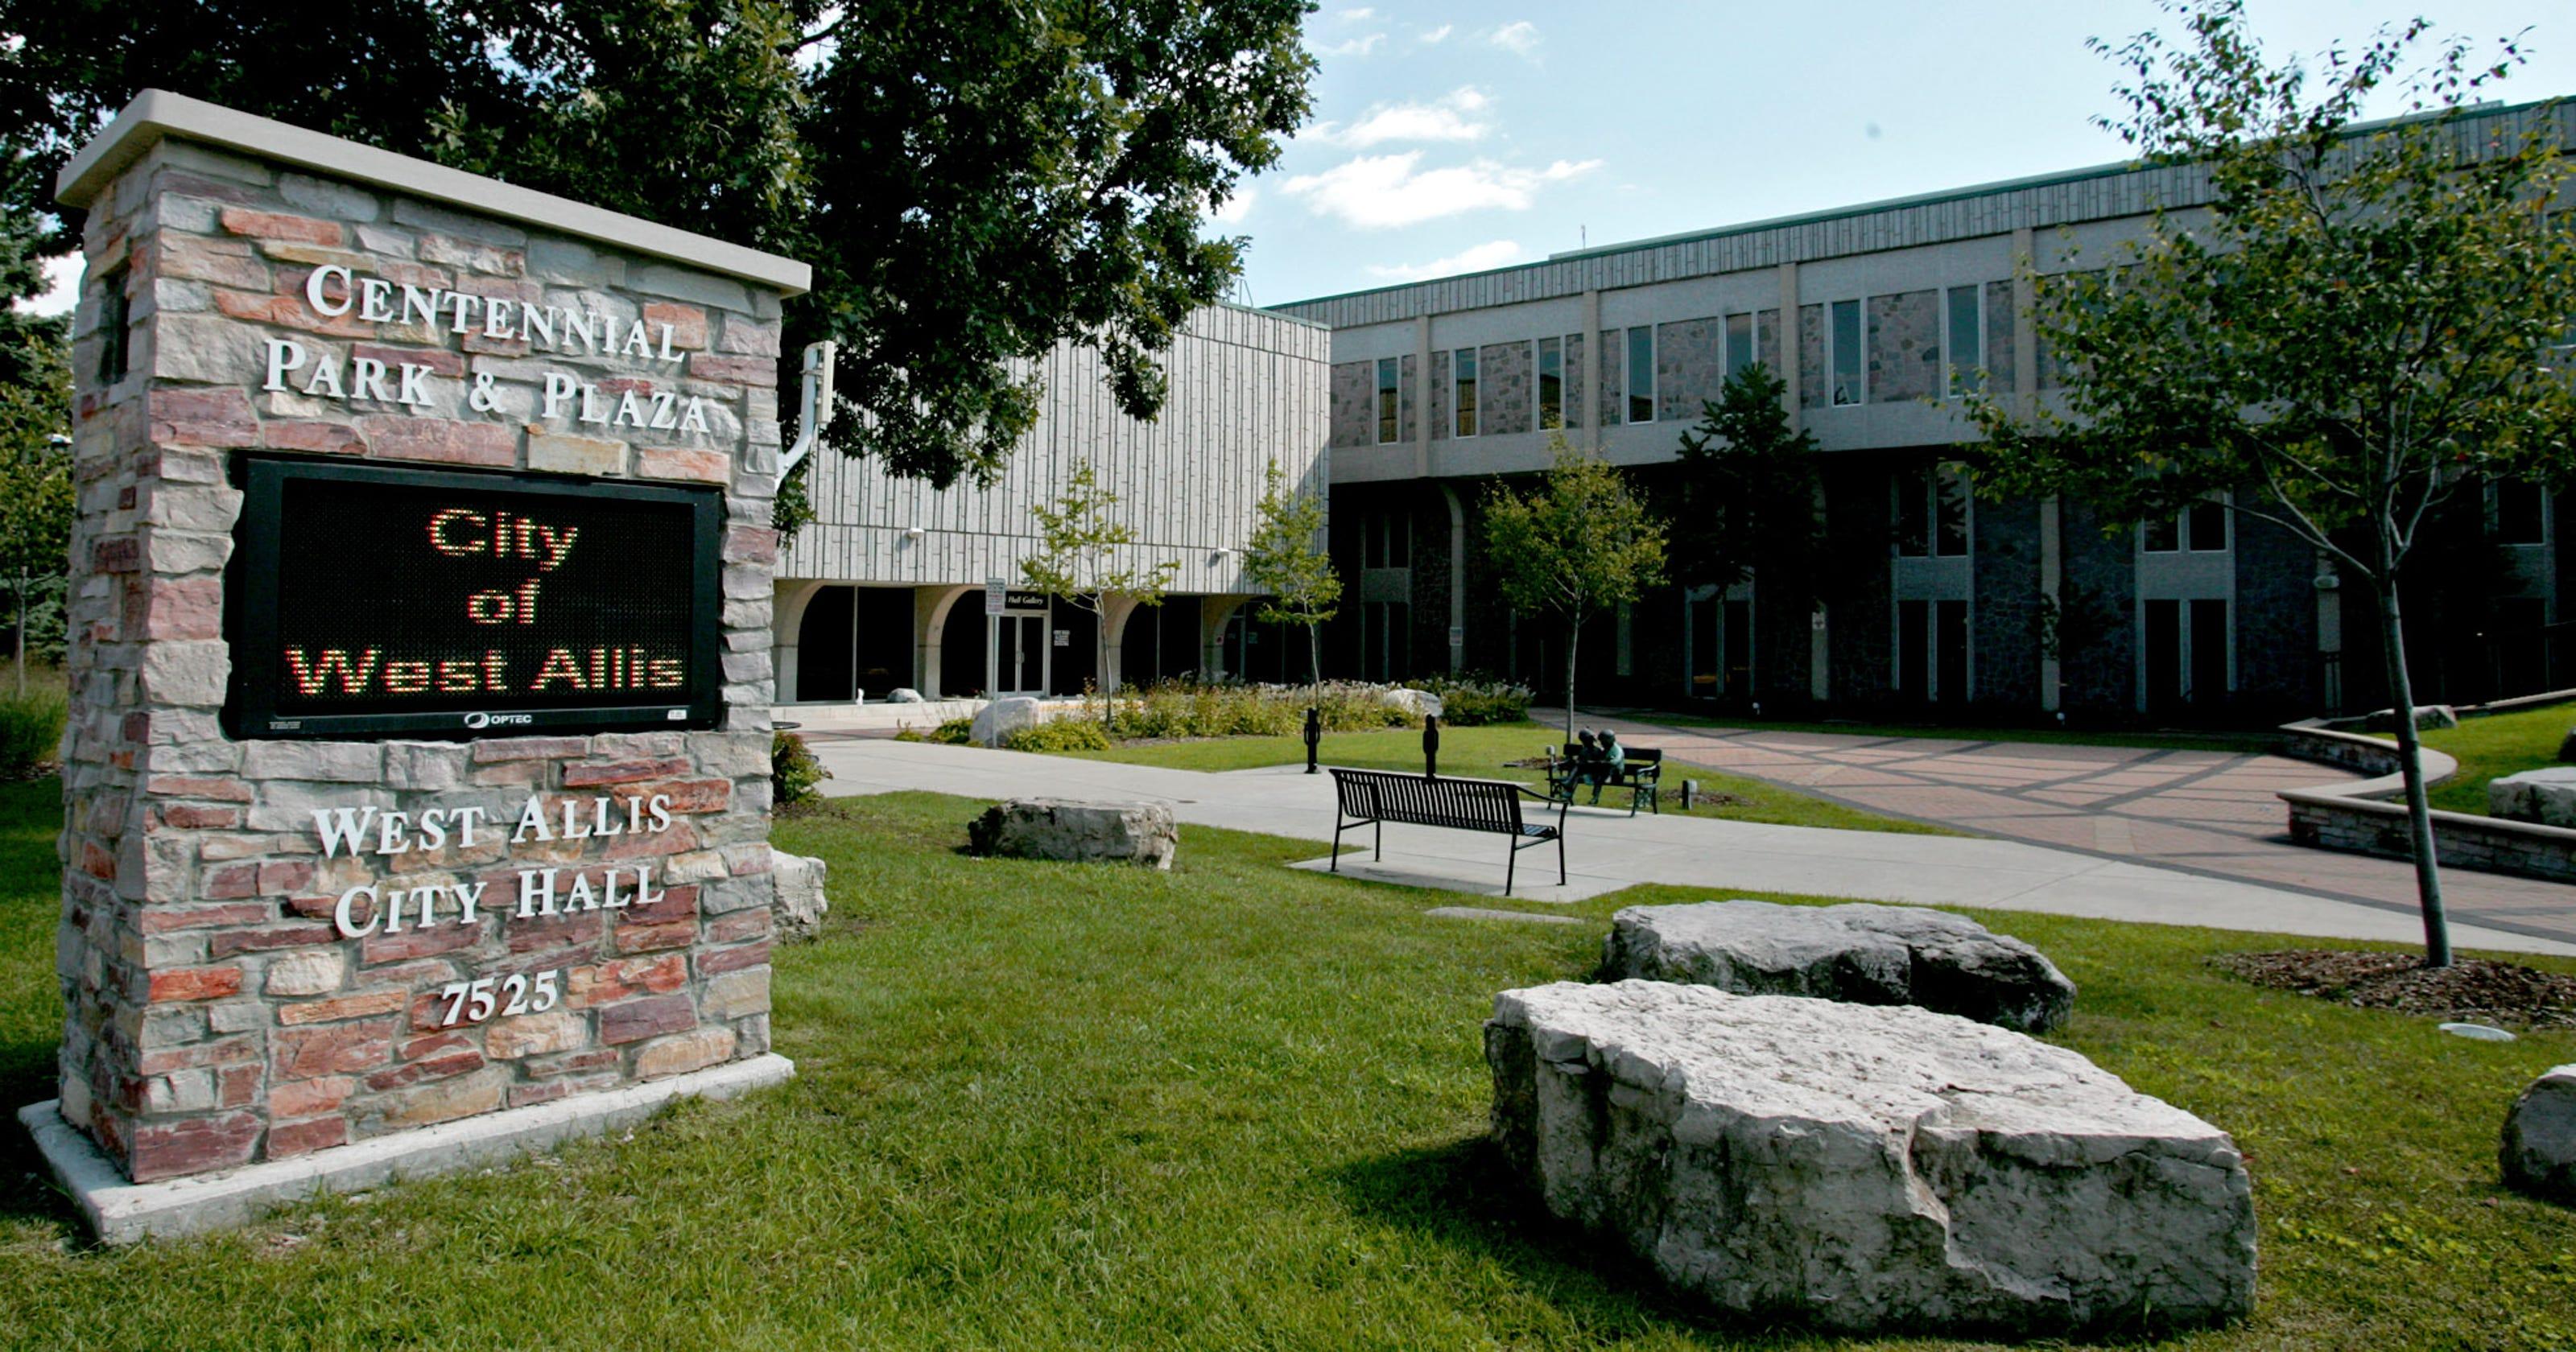 Favoritism Misdirection Uncivil Behavior In West Allis City Hall